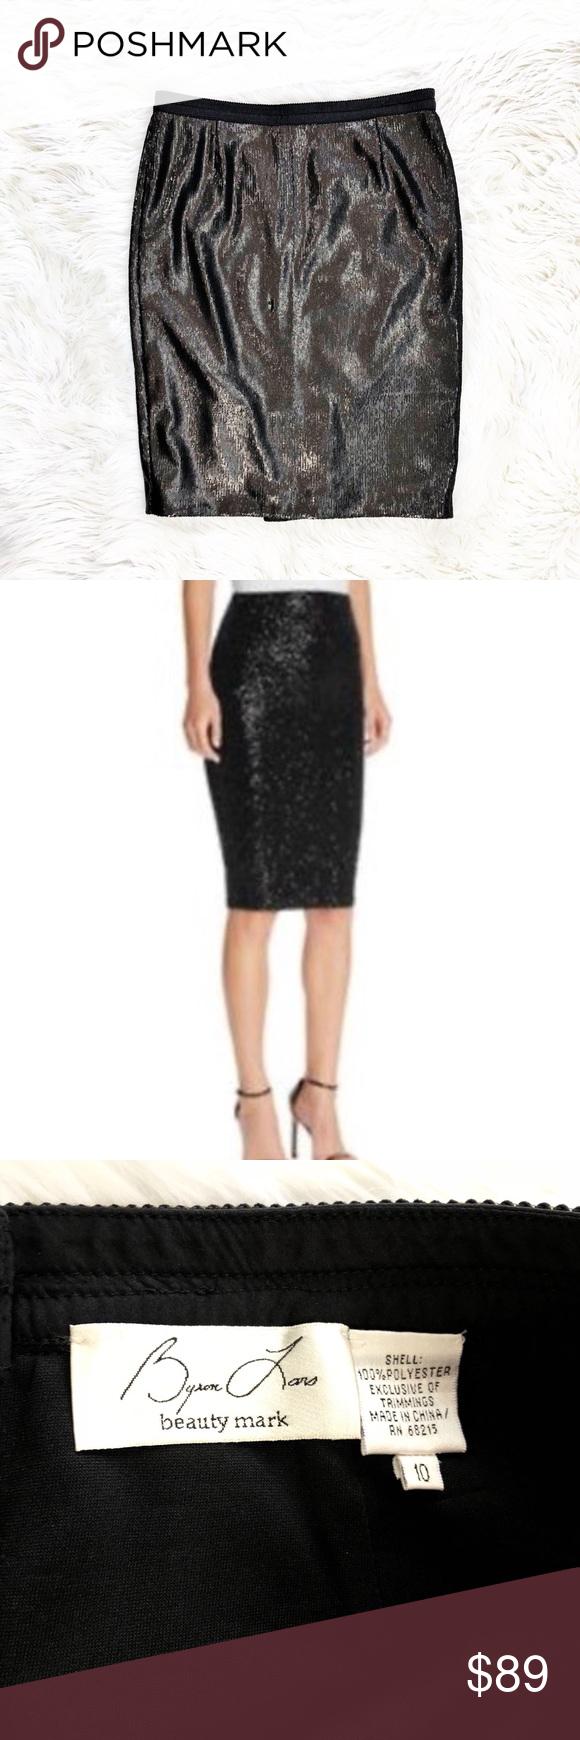 395f7b9aa1 Byron Lars Beauty Mark sequined pencil skirt Stunning solid black sequined  pencil skirt, size 10